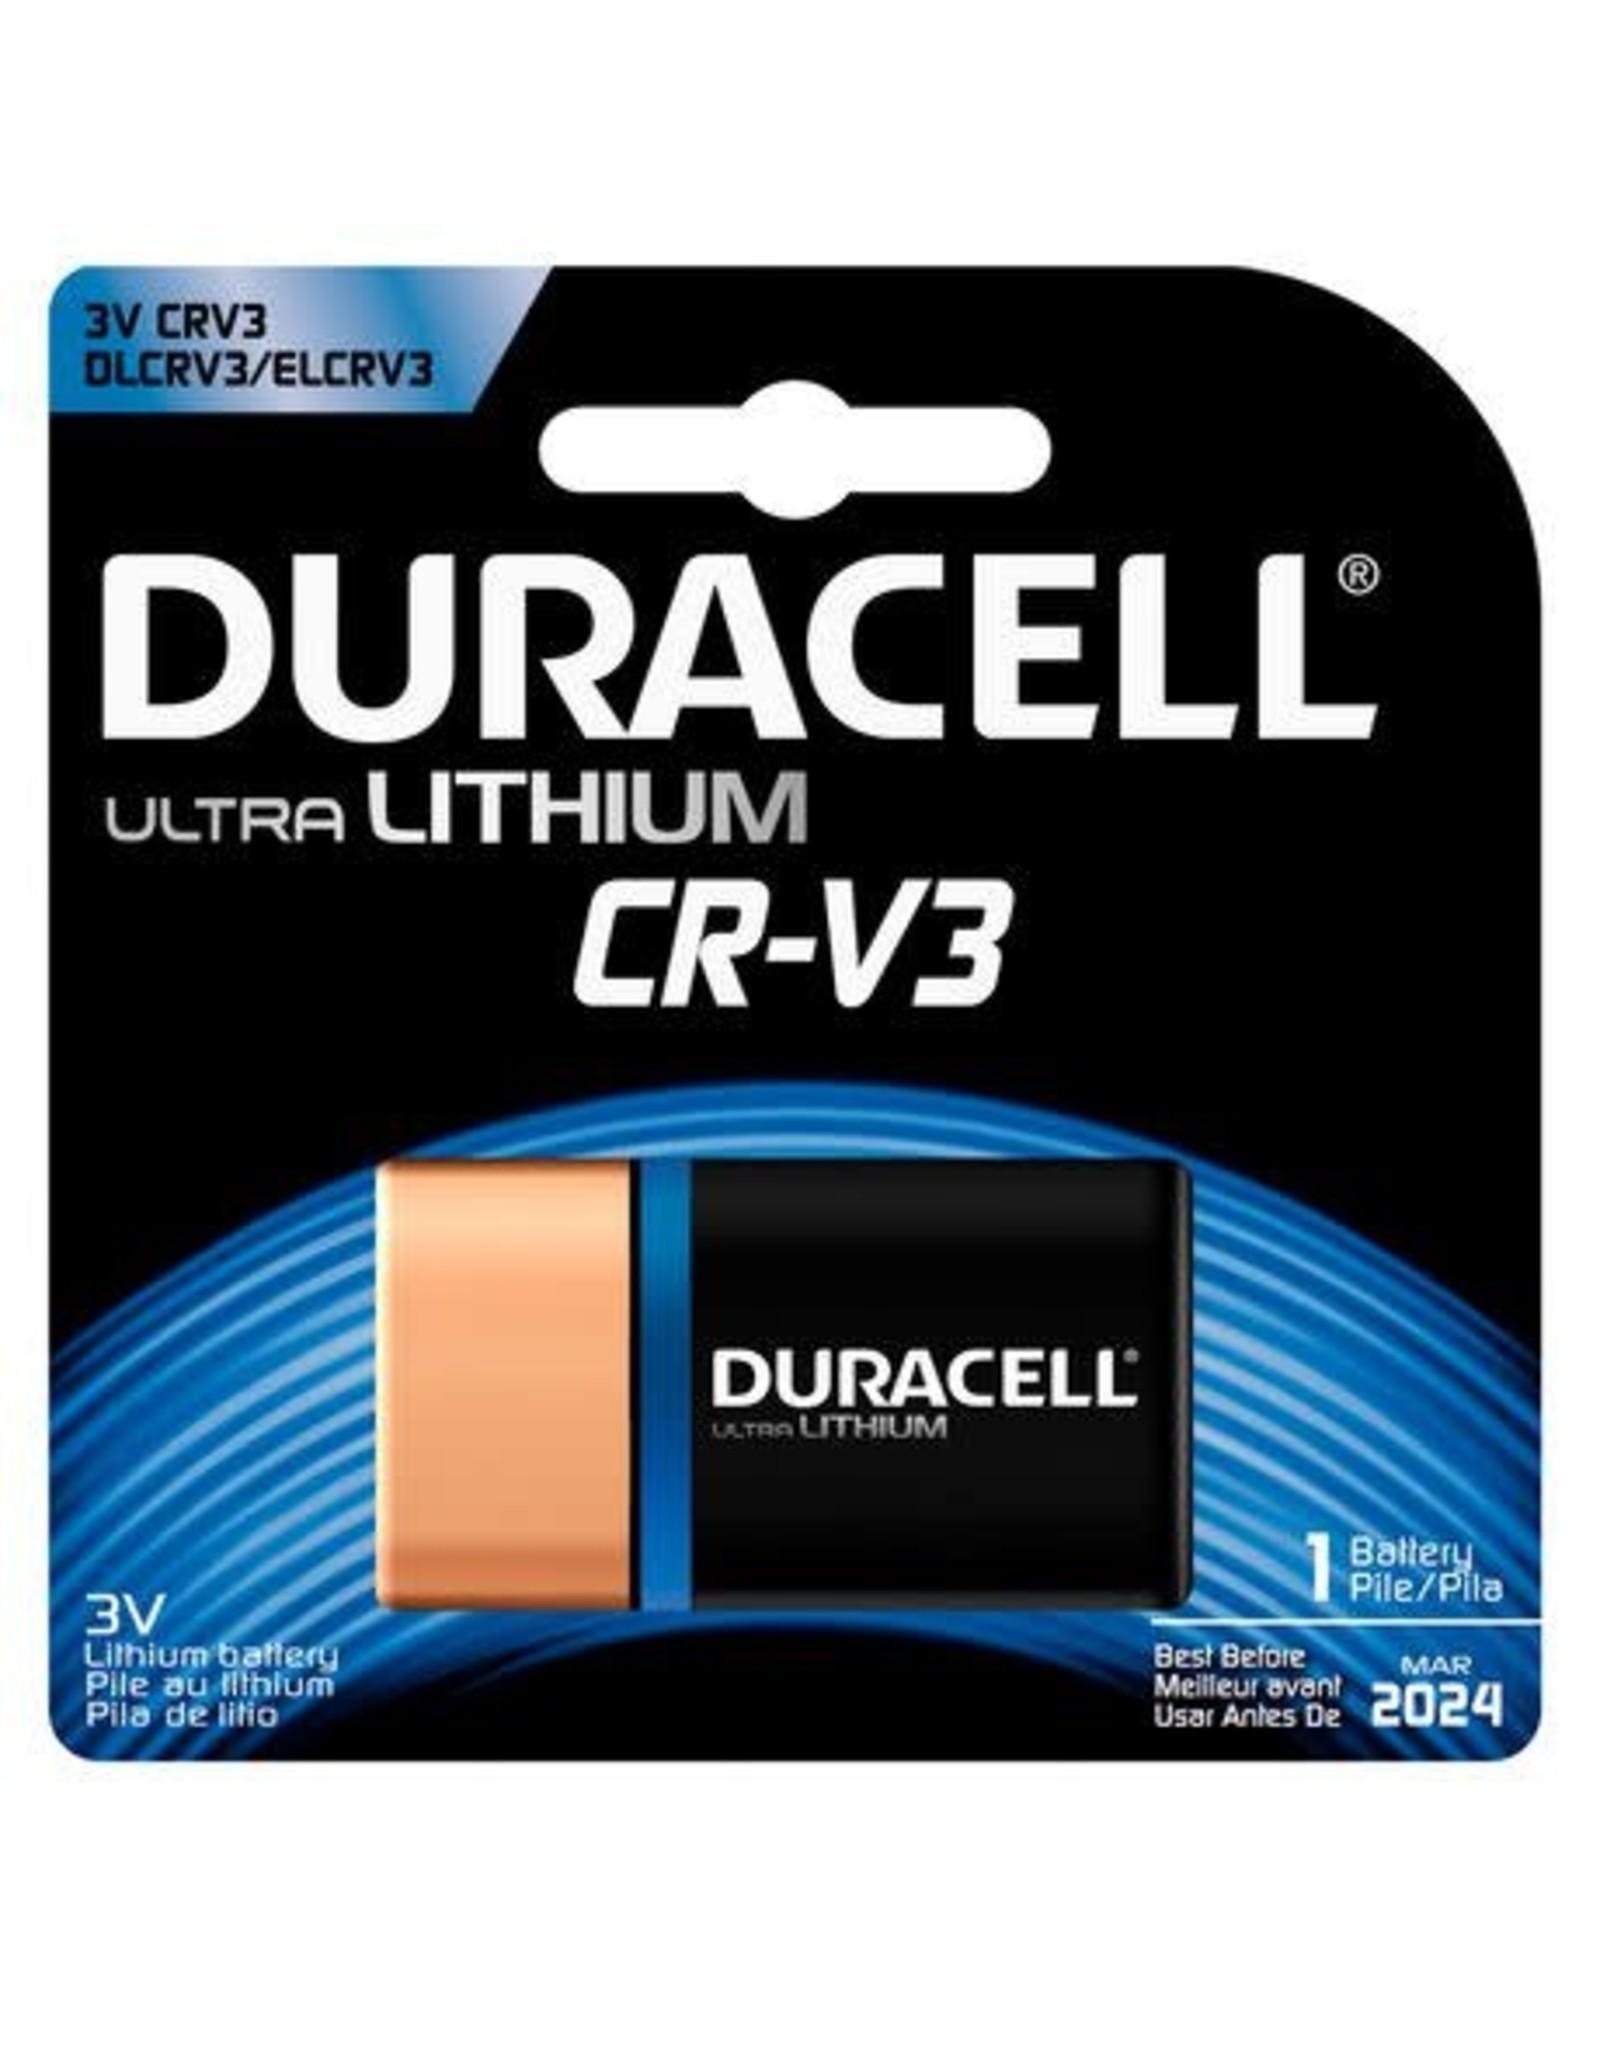 Duracell Duracell DLCRV3 3V Lithium Photo Battery 1 Pack